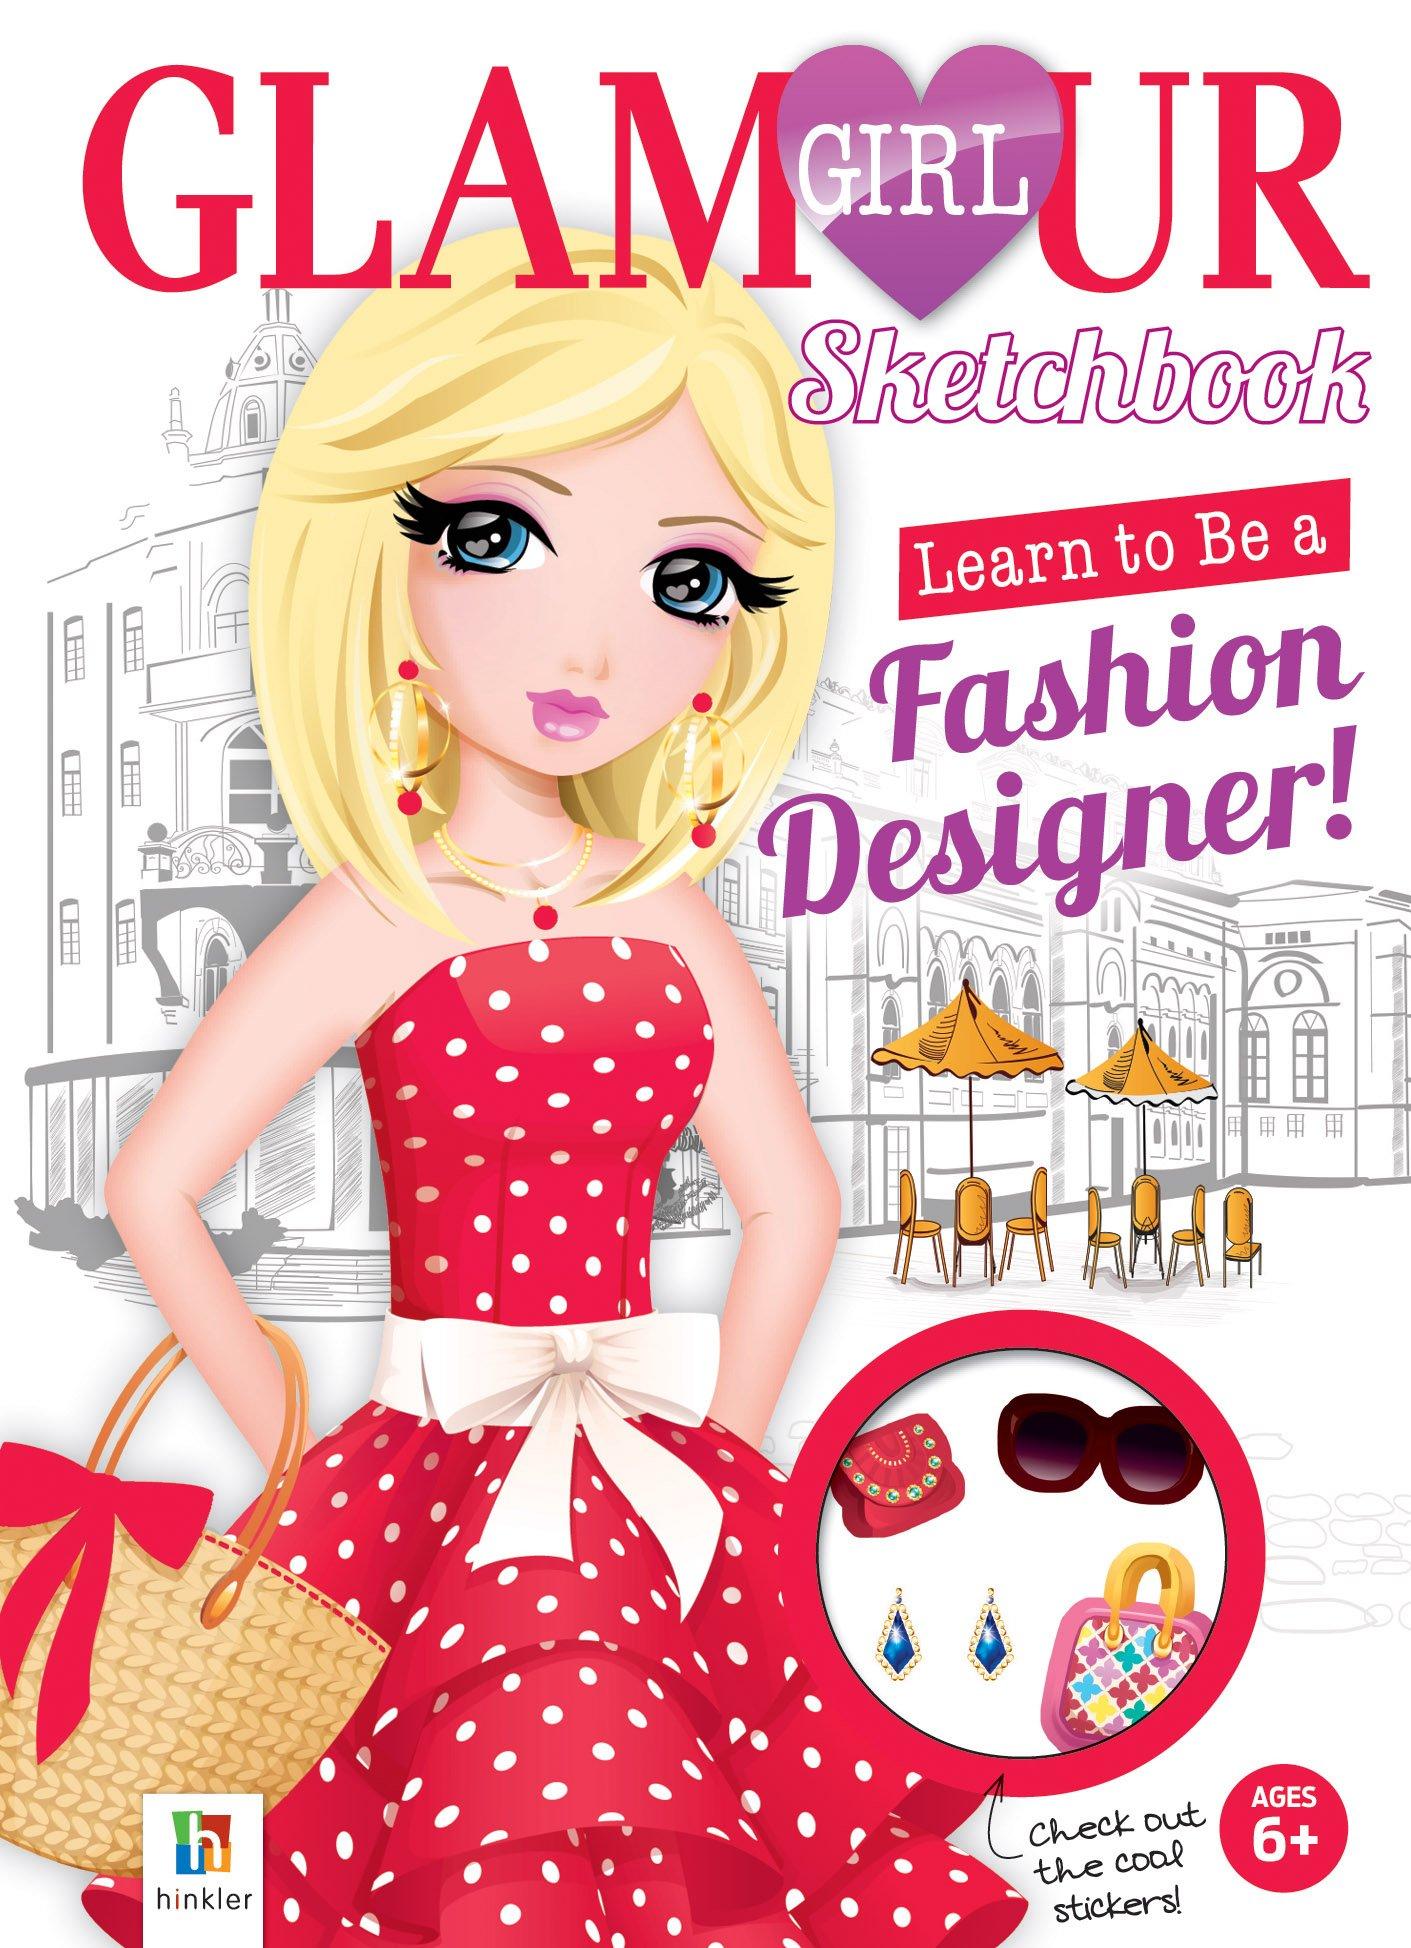 Learn To Be A Fashion Designer Sketchbook Glamour Glamour Girl Hinkler Books 9781743527641 Amazon Com Books